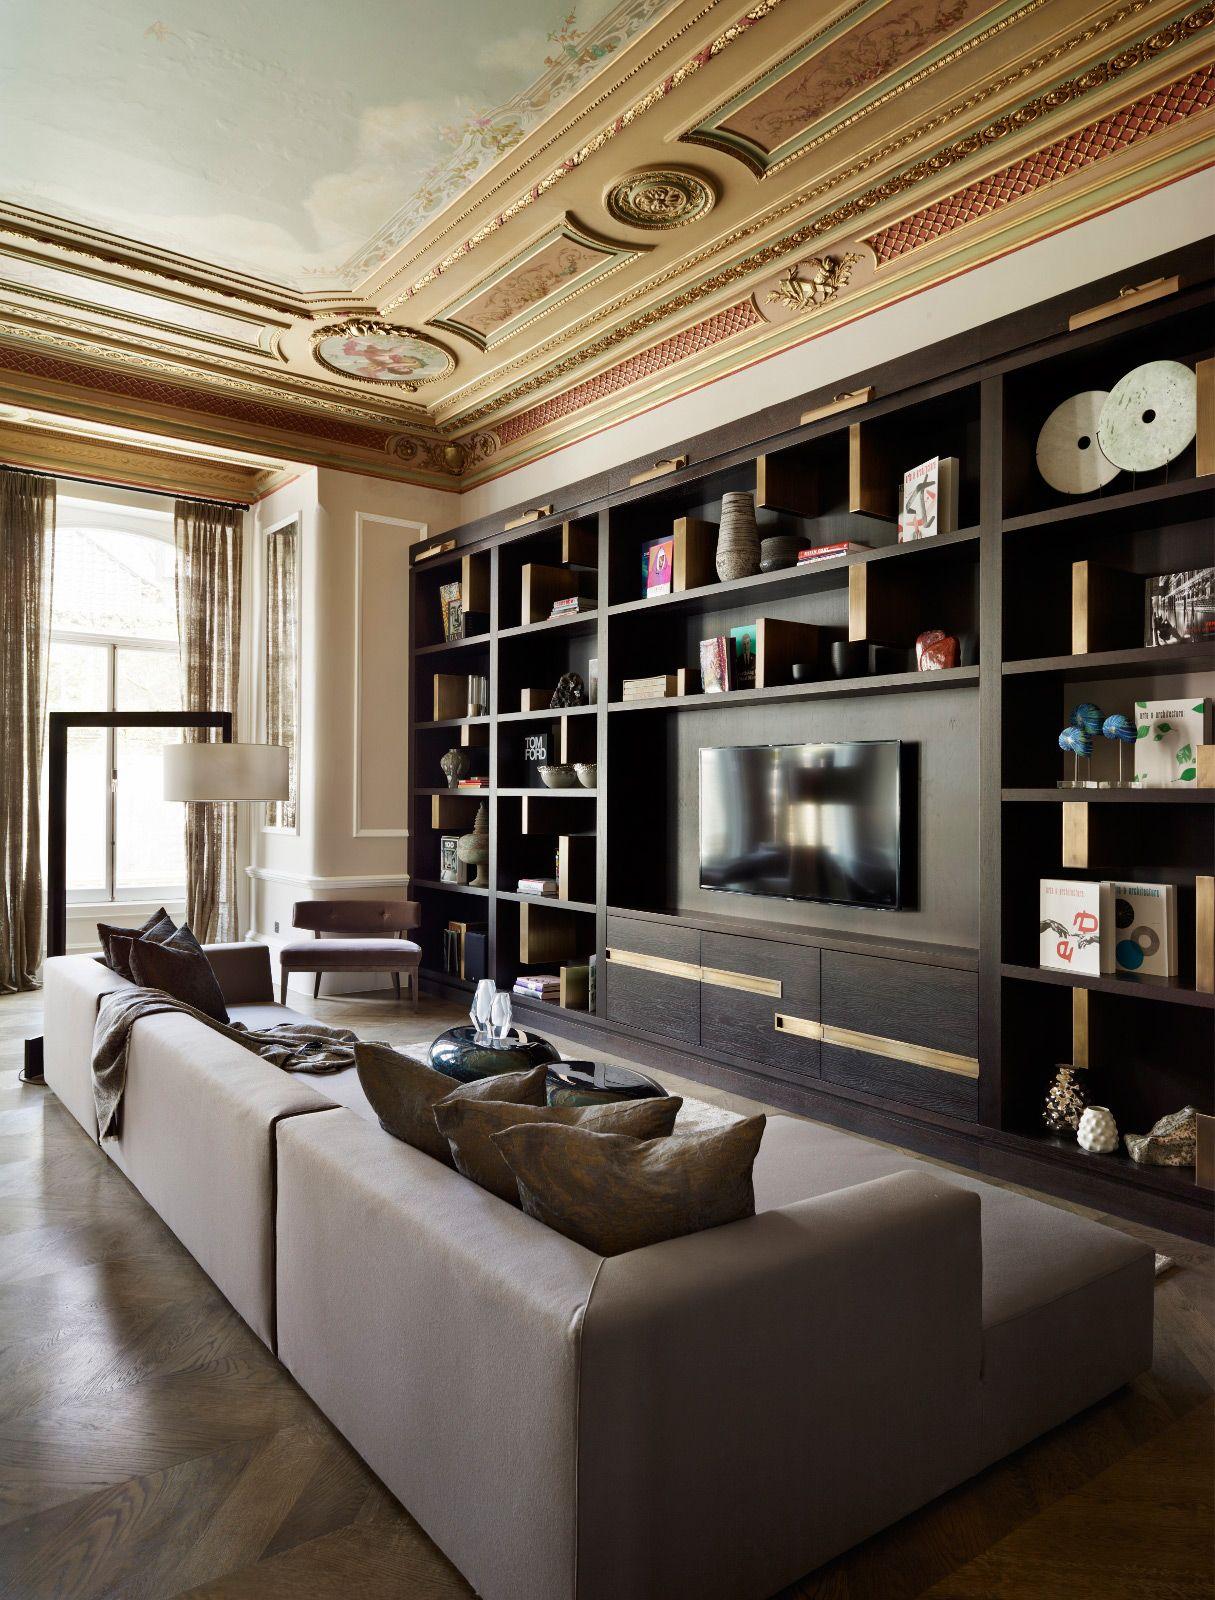 Tv Showcase Design Ideas For Living Room Decor 15524: London Based Luxury Interior Design. International